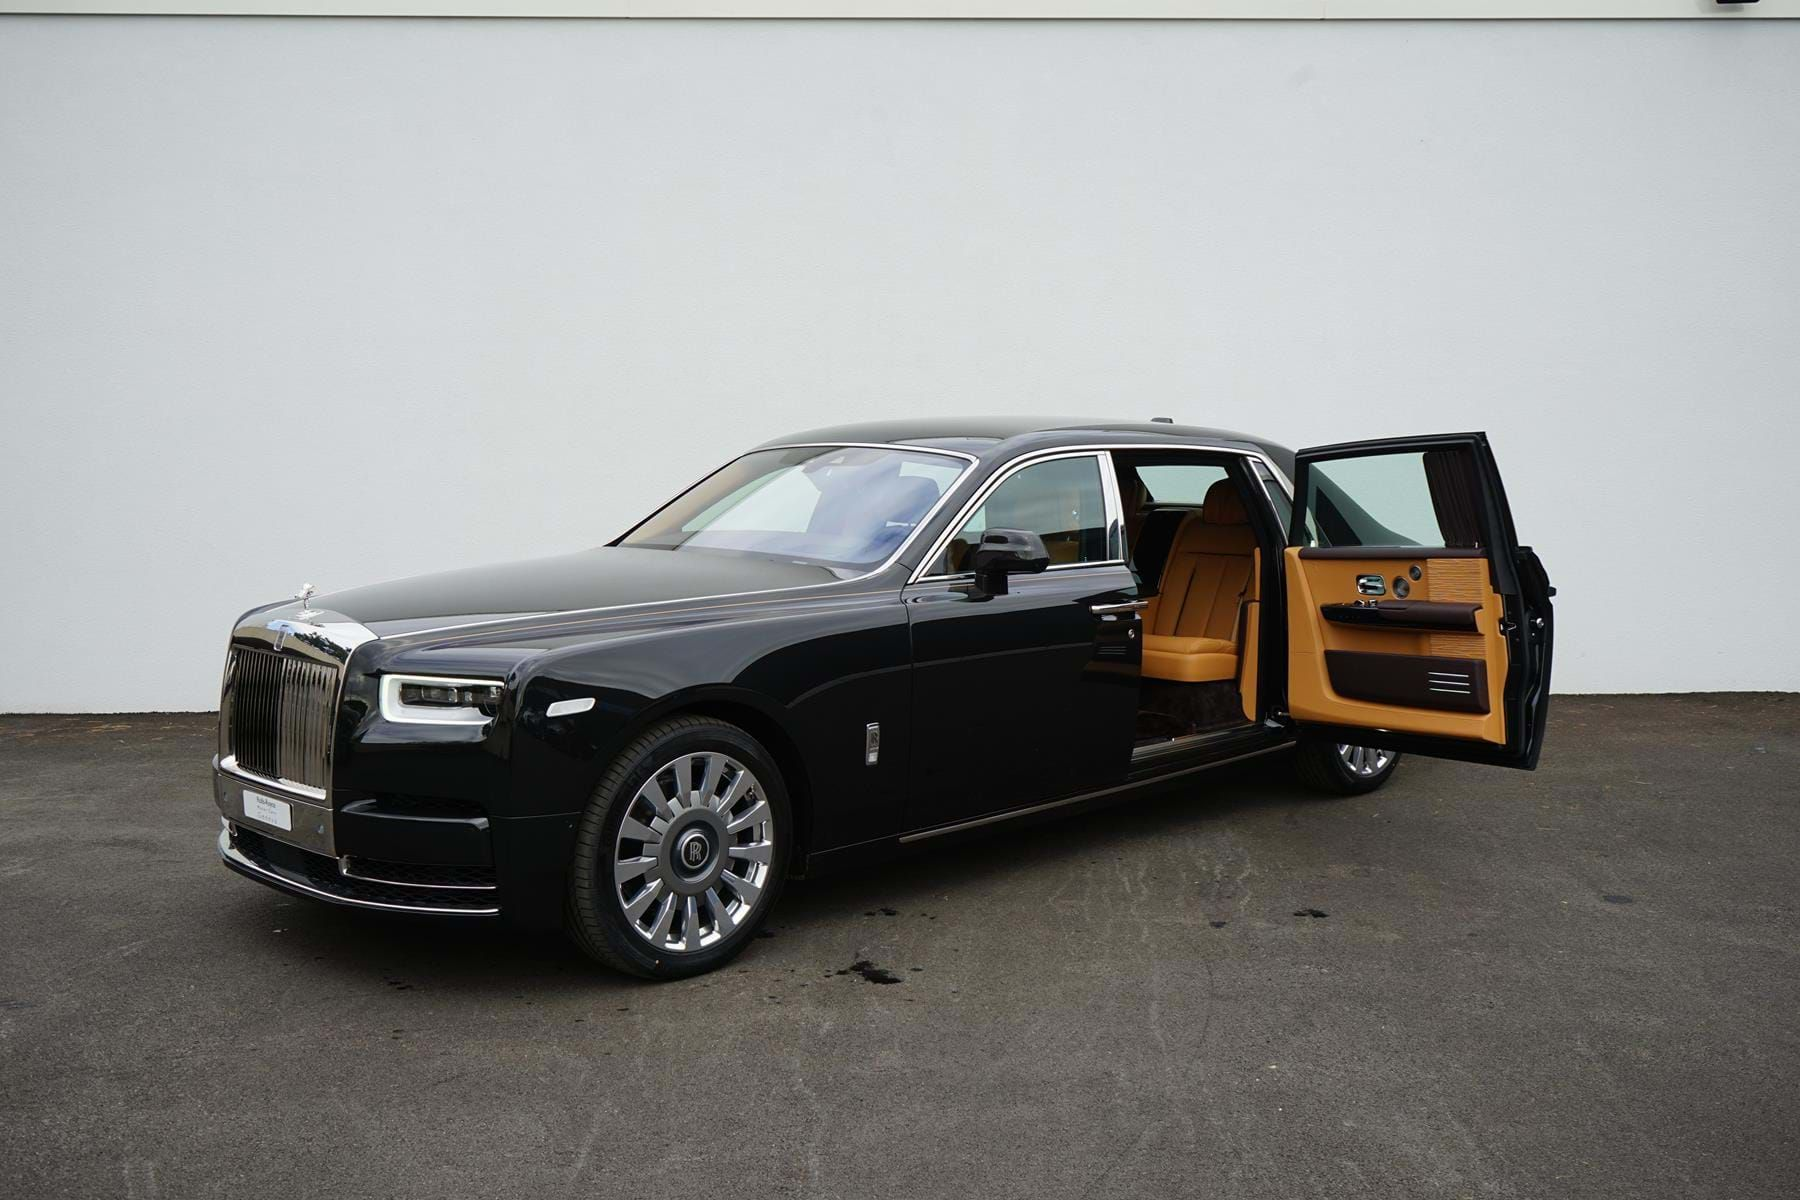 Rolls Royce Phantom Viii Extended Wheelbase Luxury Pulse Cars Swaziland For Sale On Luxurypulse Rolls Royce Phantom Luxury Cars Rolls Royce Rolls Royce